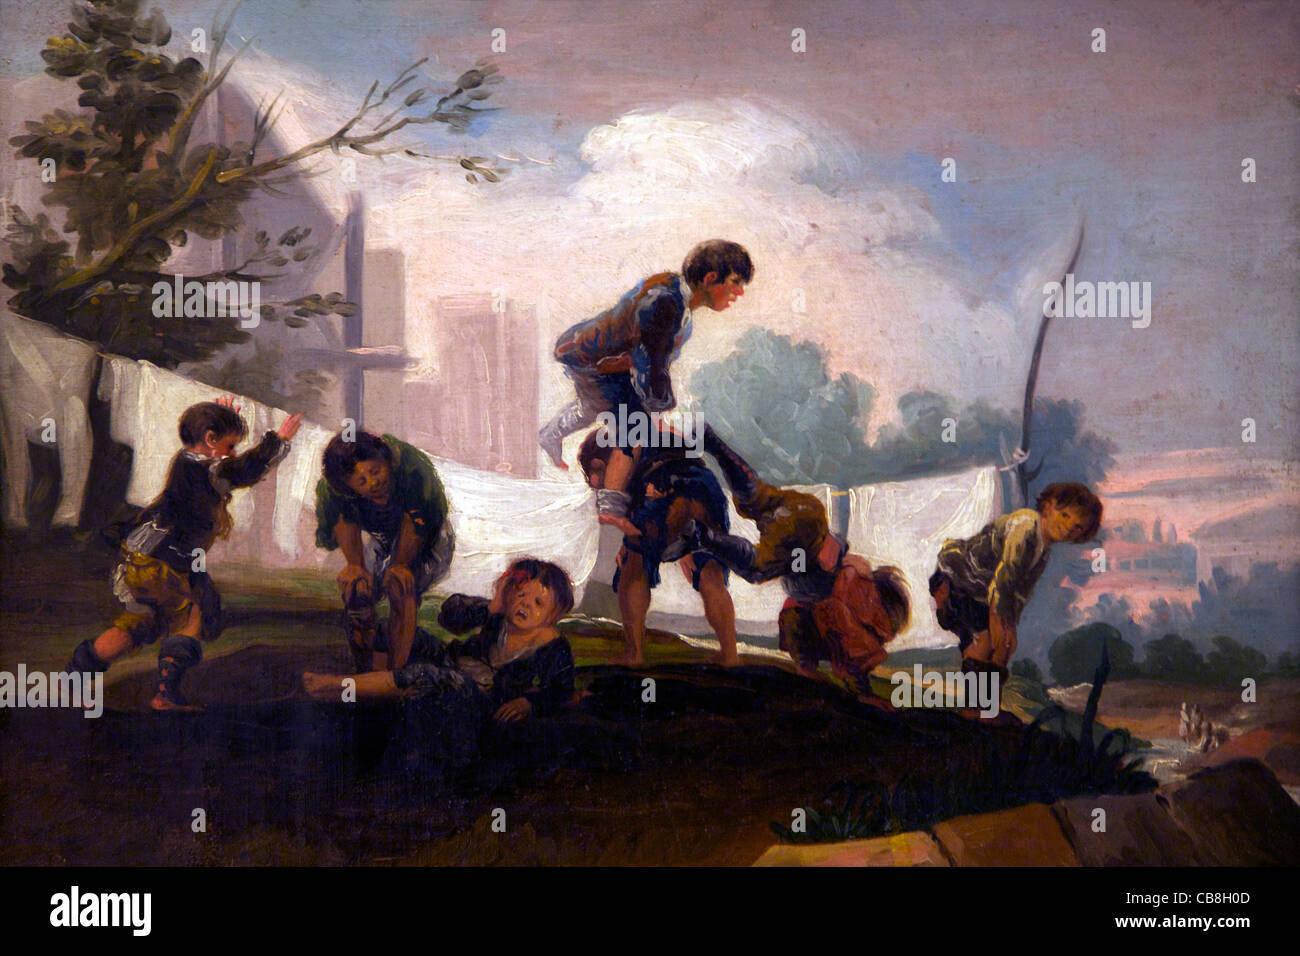 Children jumping, by Francisco de Goya y Lucientes, Royal Academy of San Fernando Madrid Spain - Stock Image